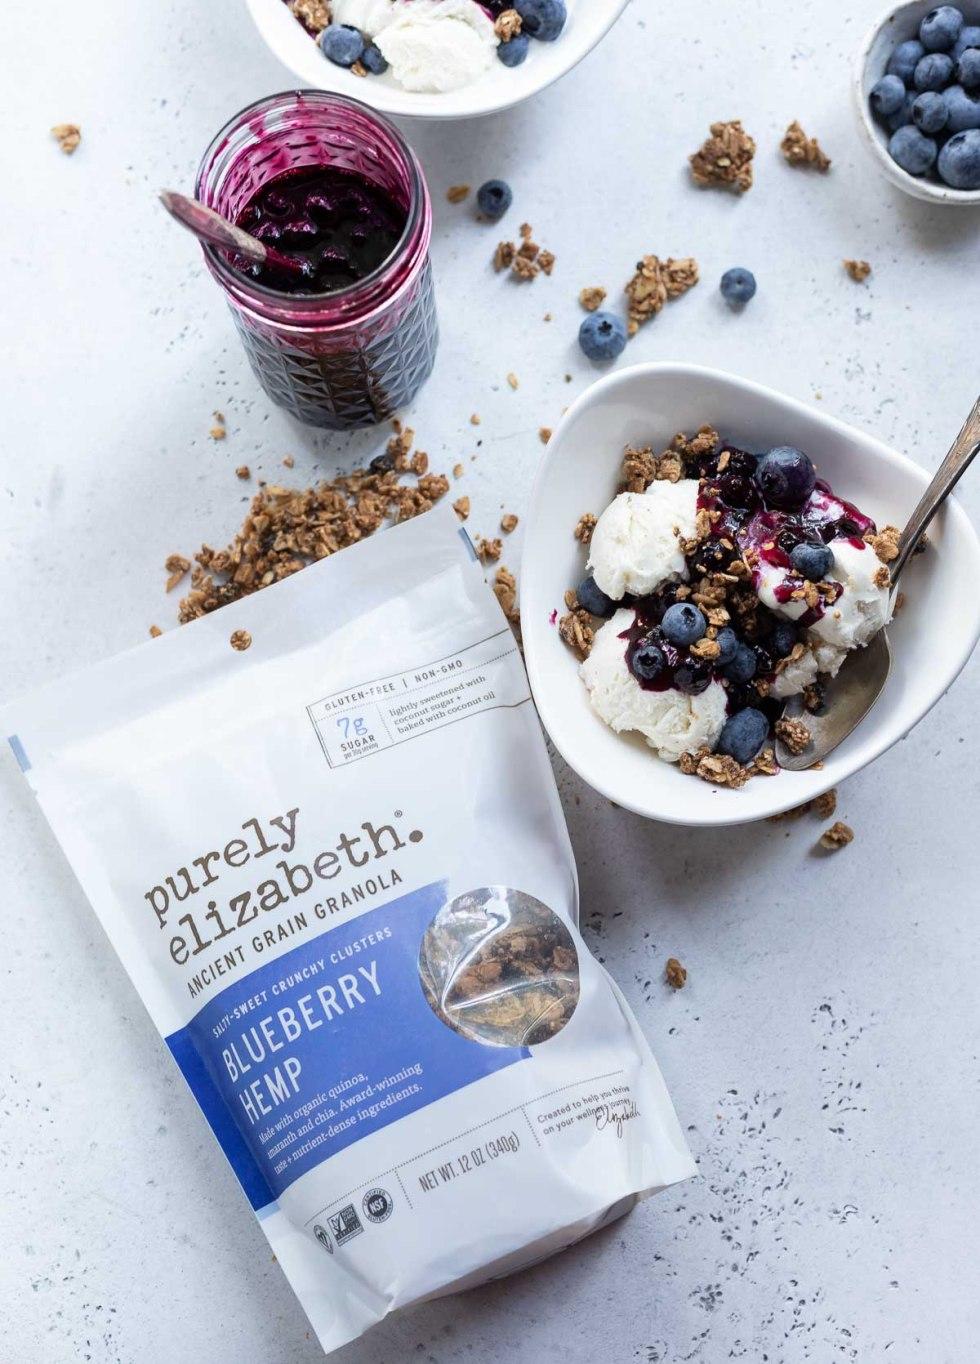 ice cream parfait next to bag of granola and jar of blueberry sauce